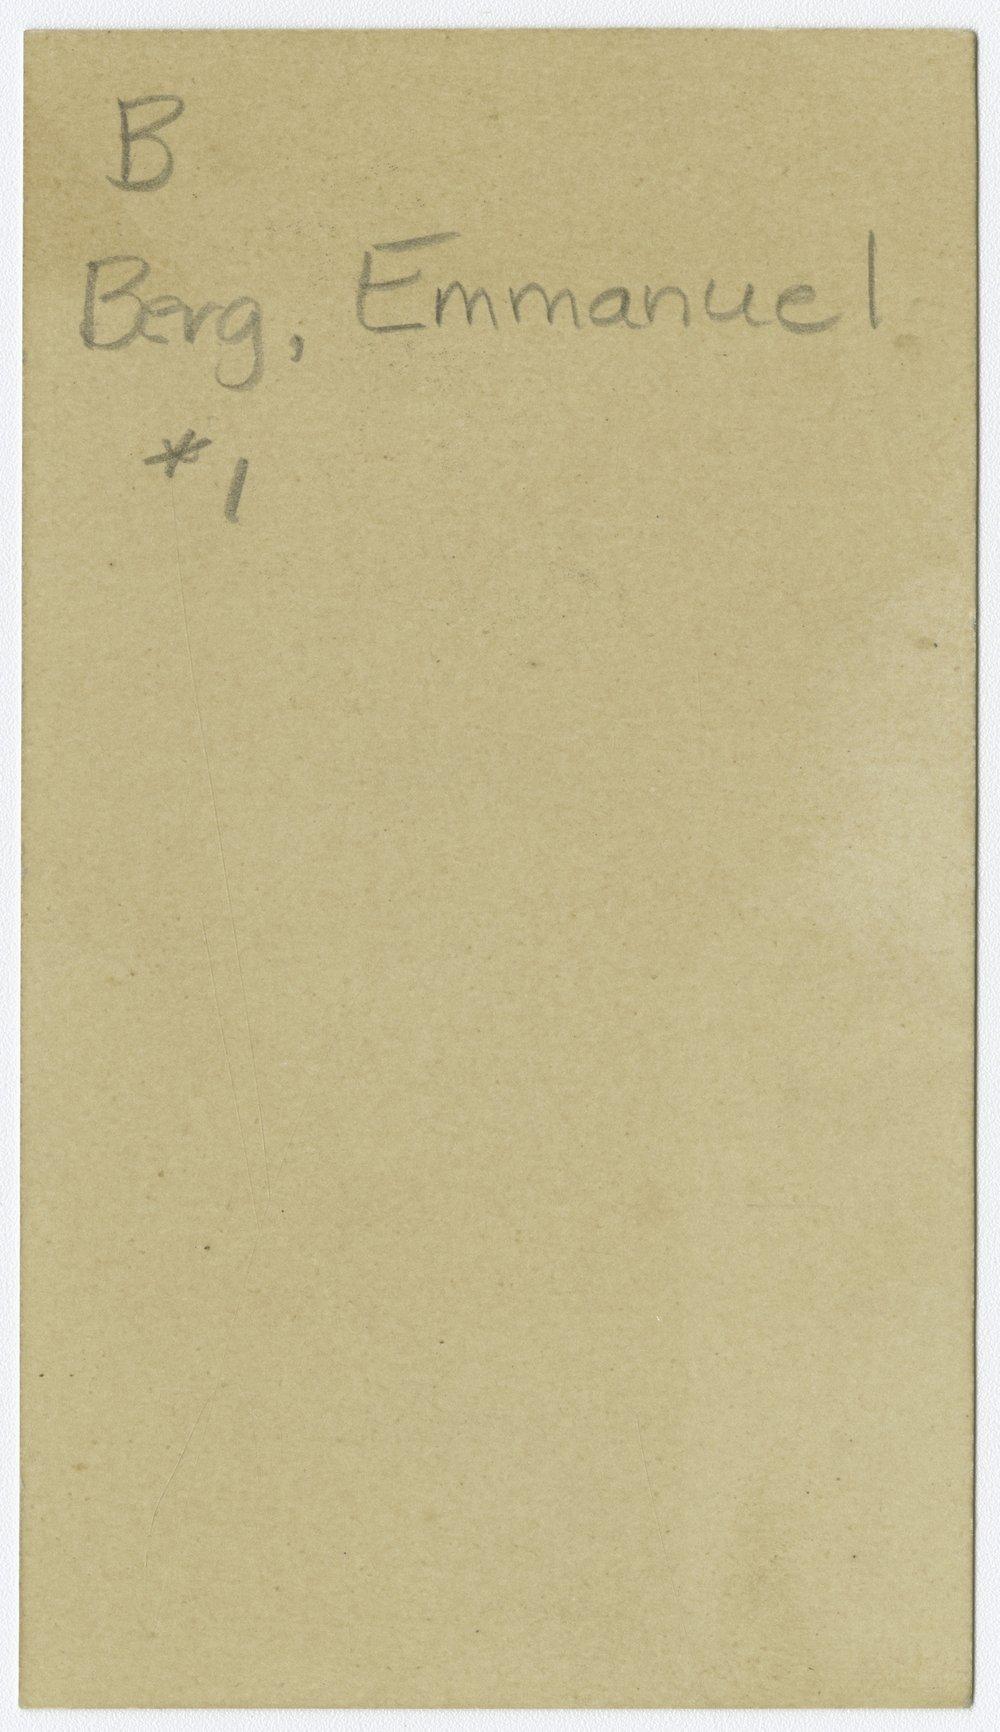 Emmanuel Berg calling card, McPherson, Kansas - 2